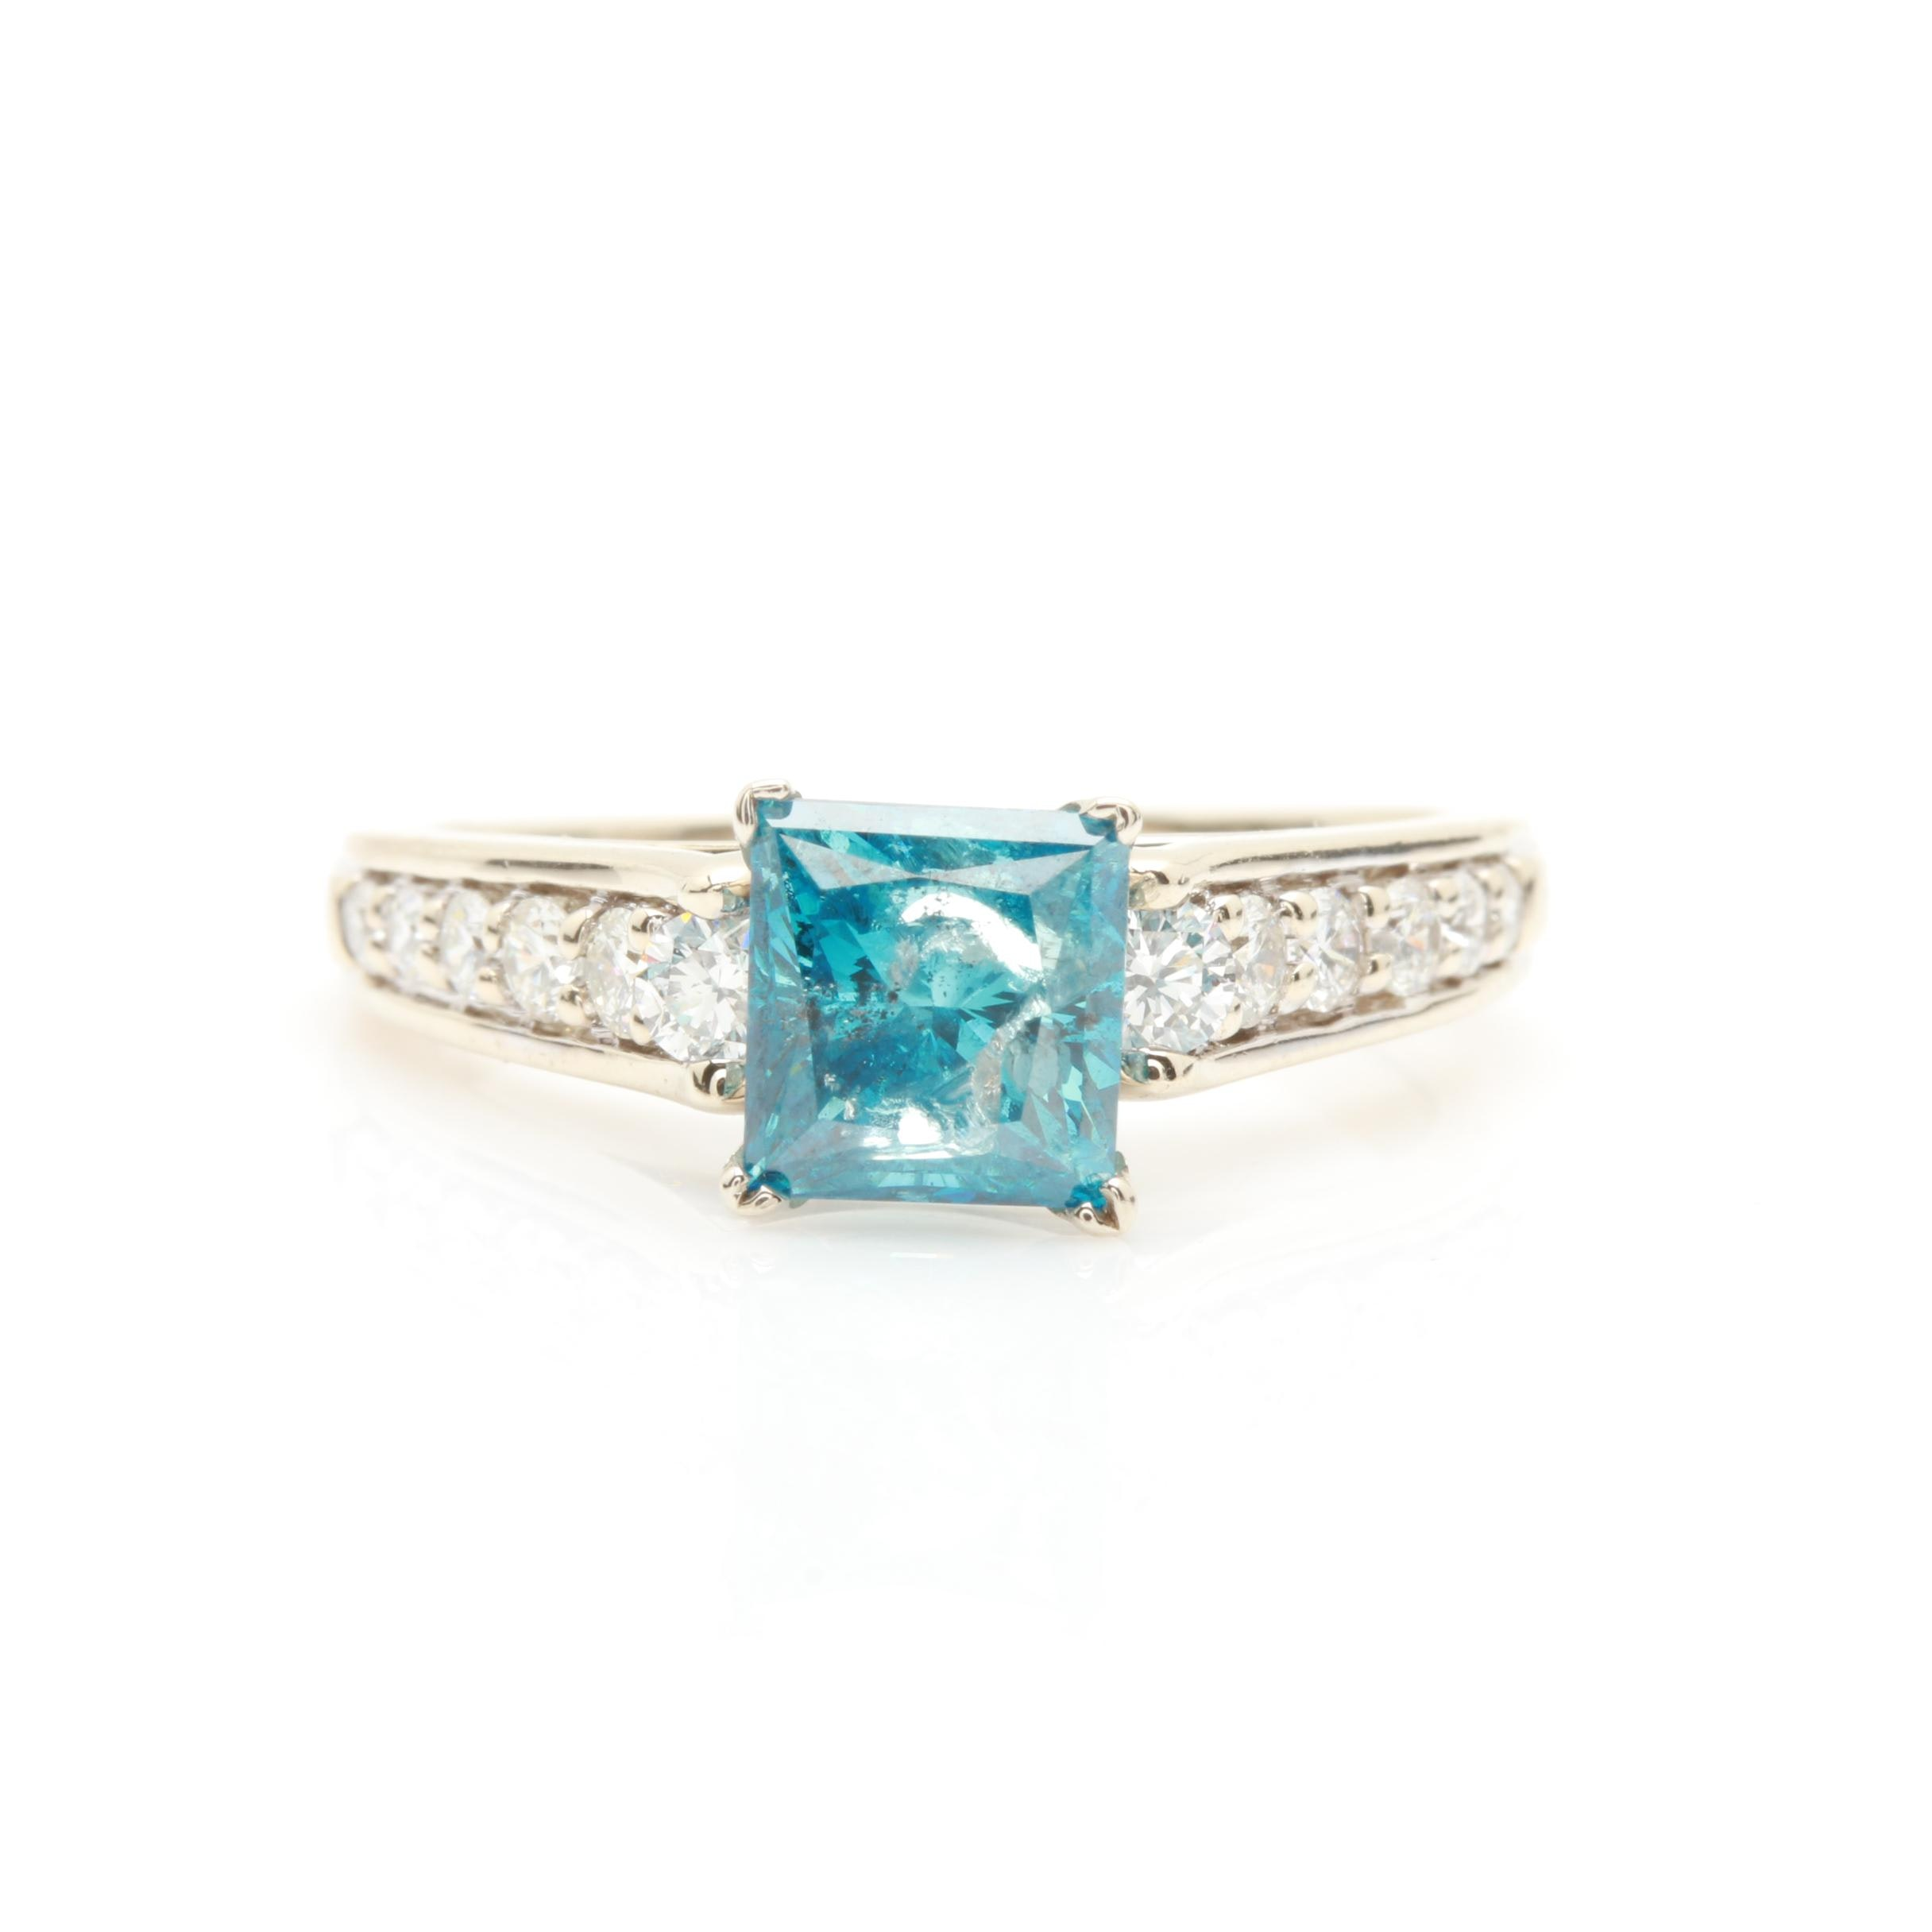 14K White Gold 2.06 CTW Diamond Ring